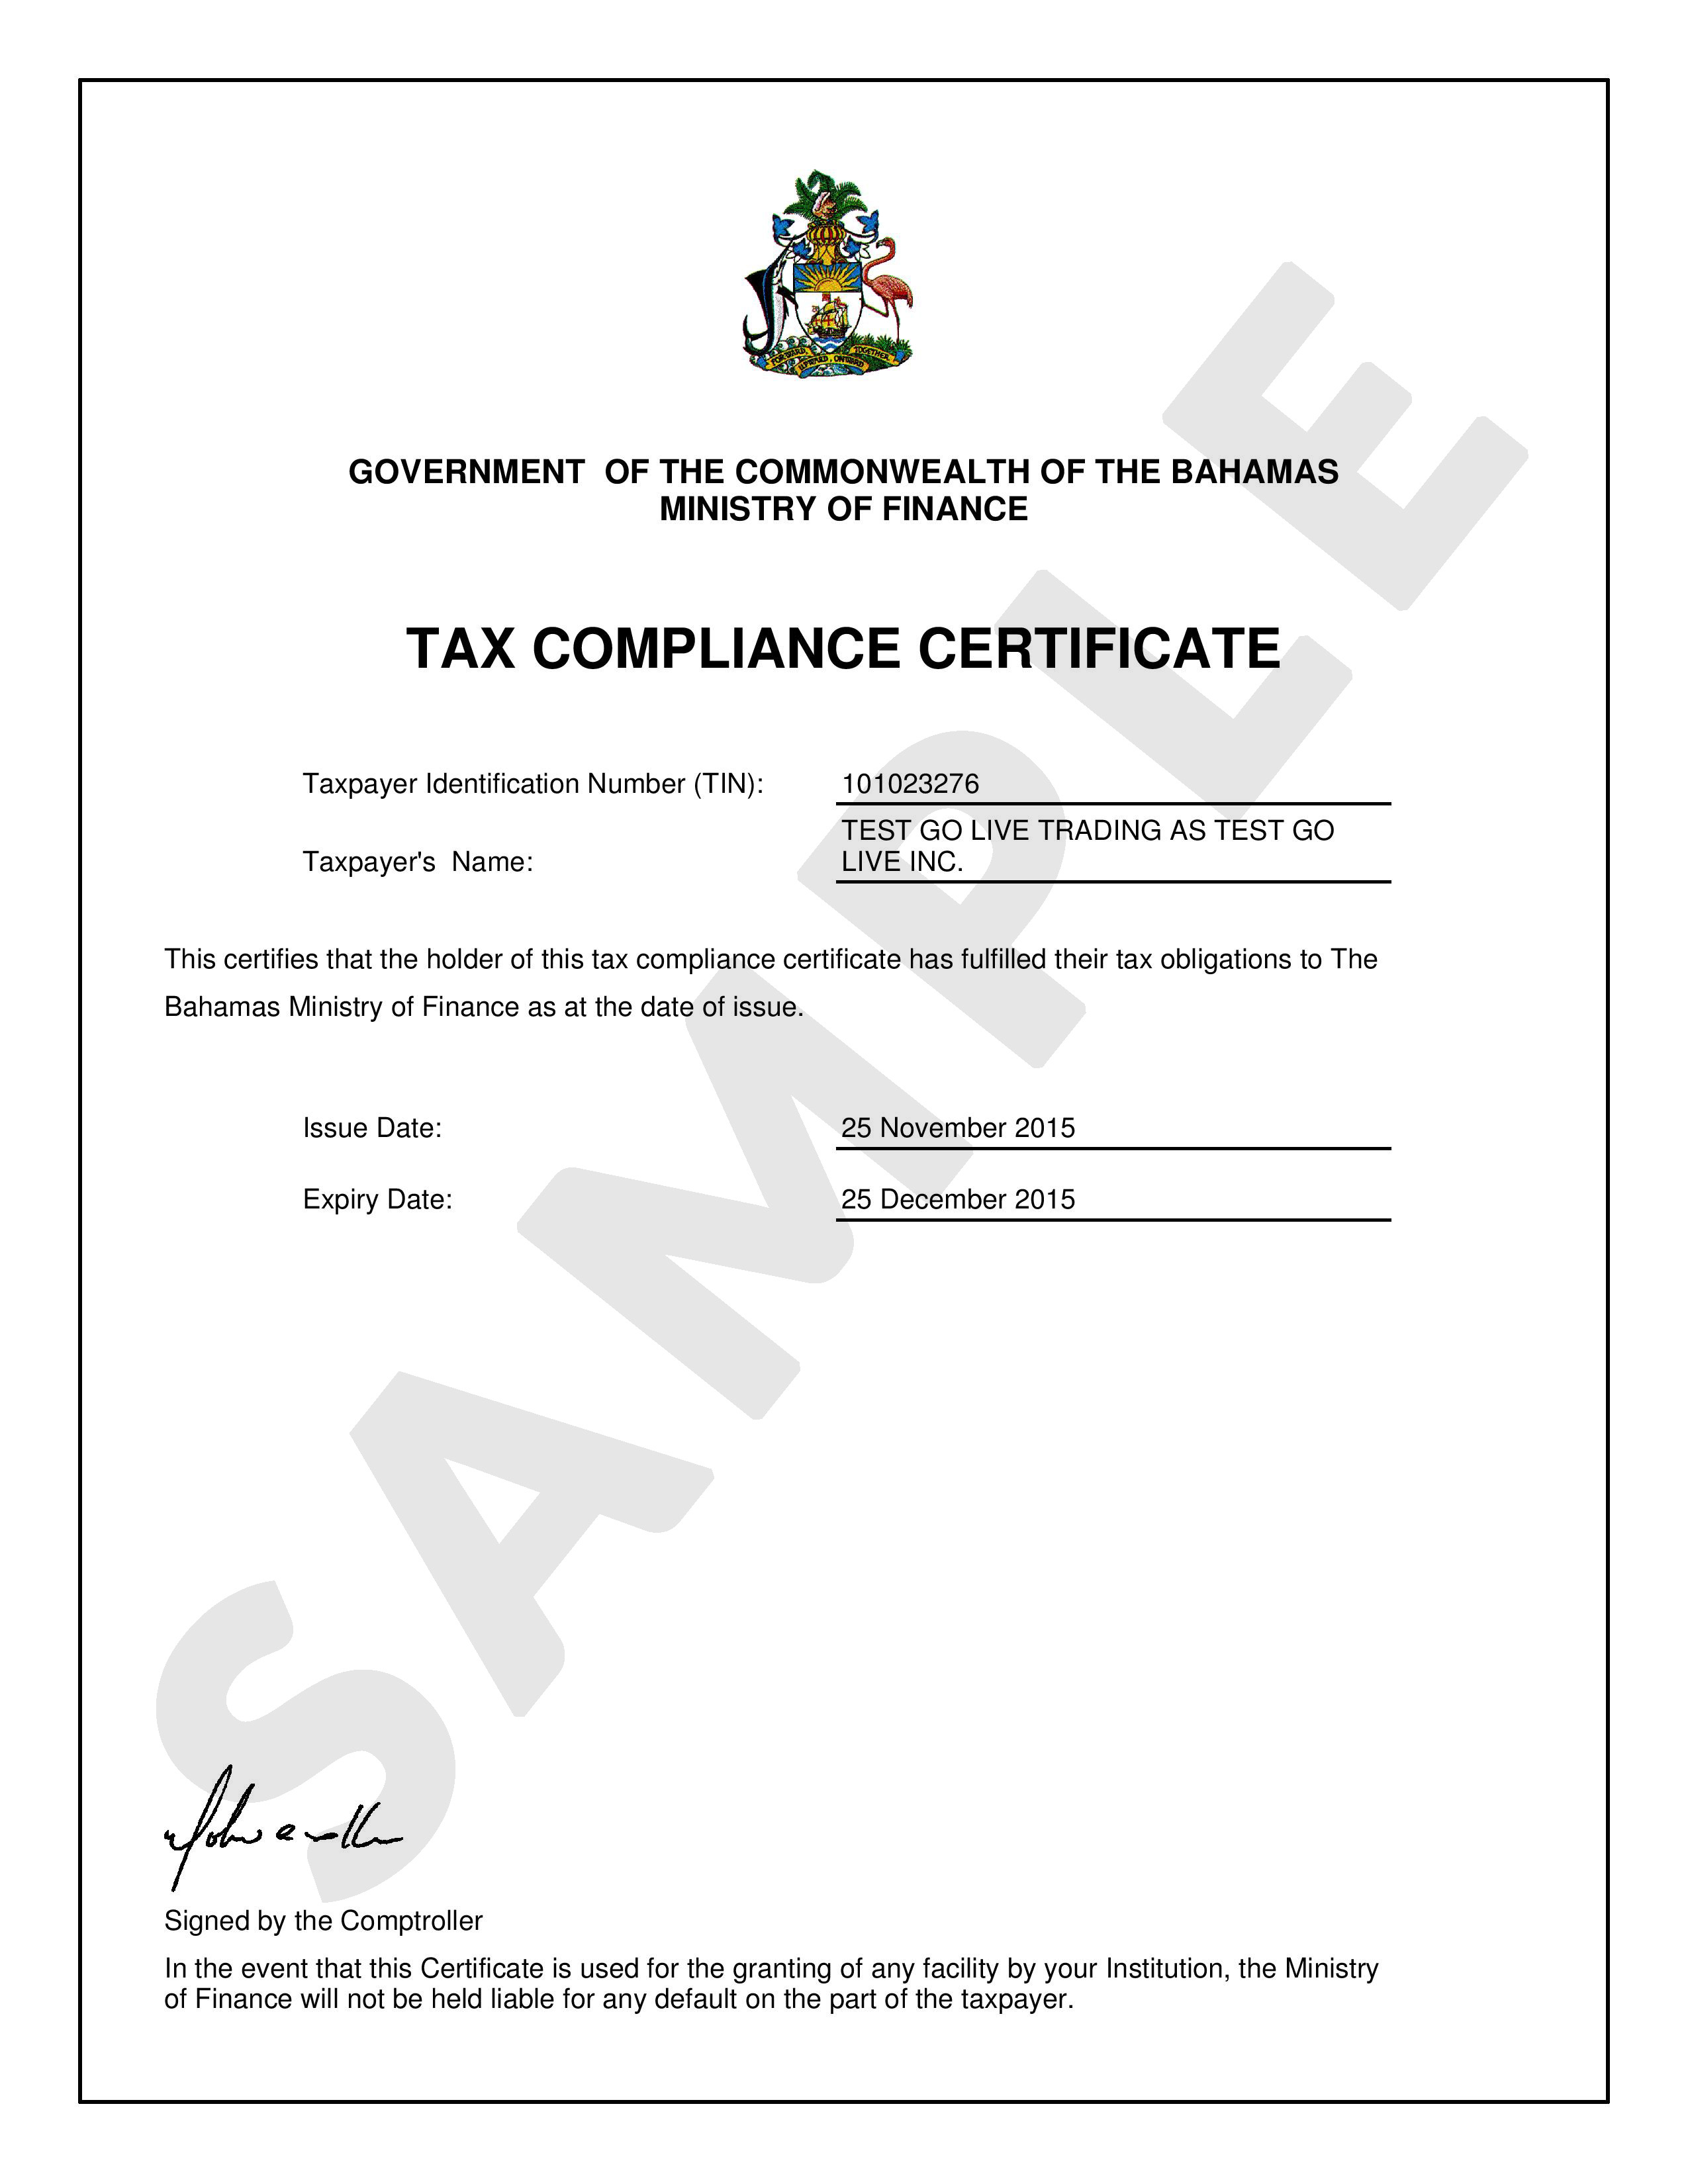 Tax Compliance Certificate